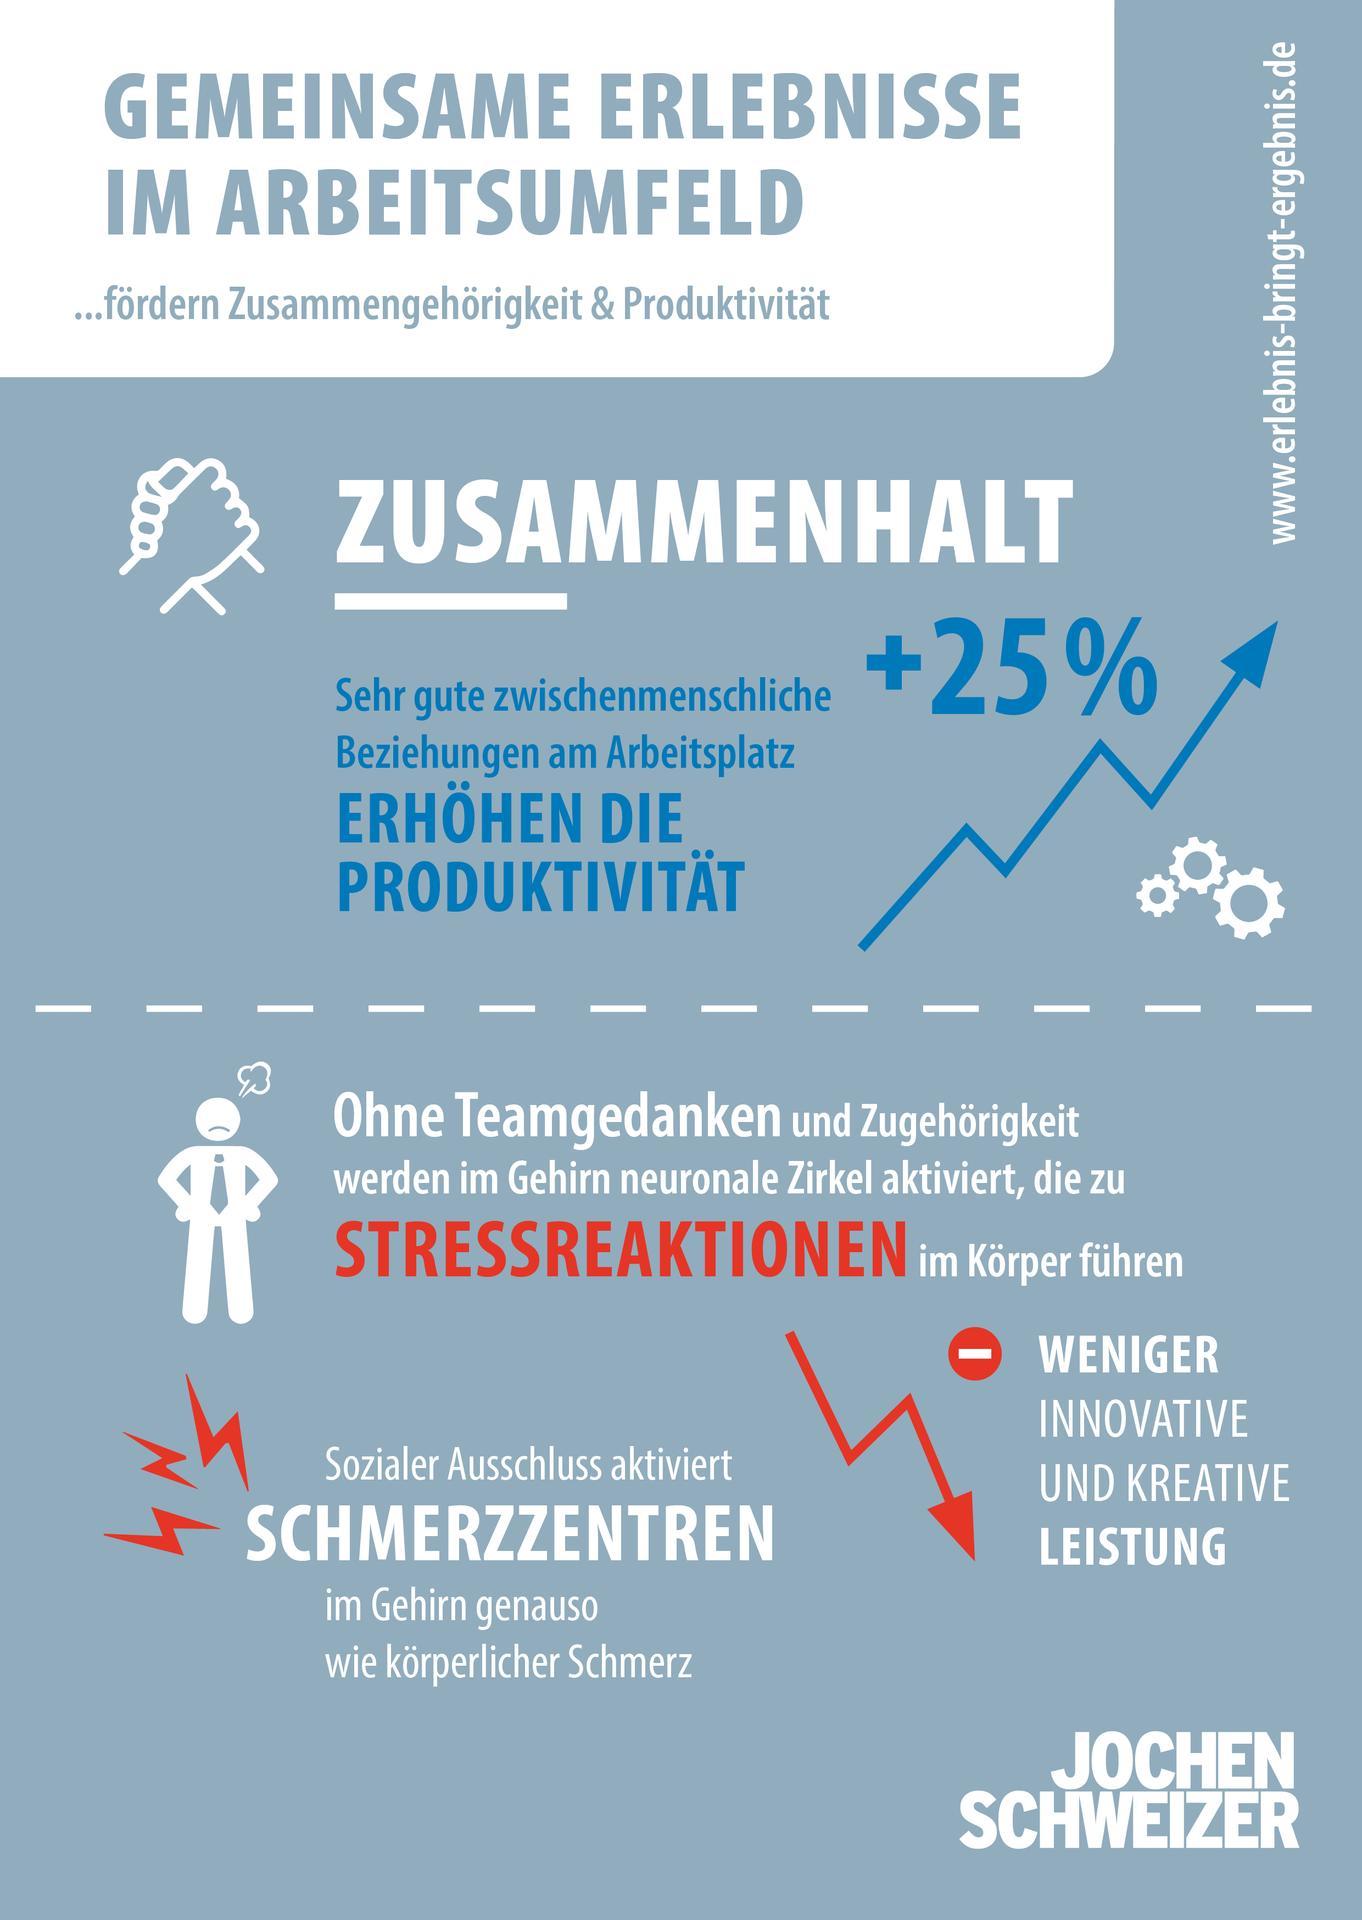 Jochen Schweizer Presse: Mediathek